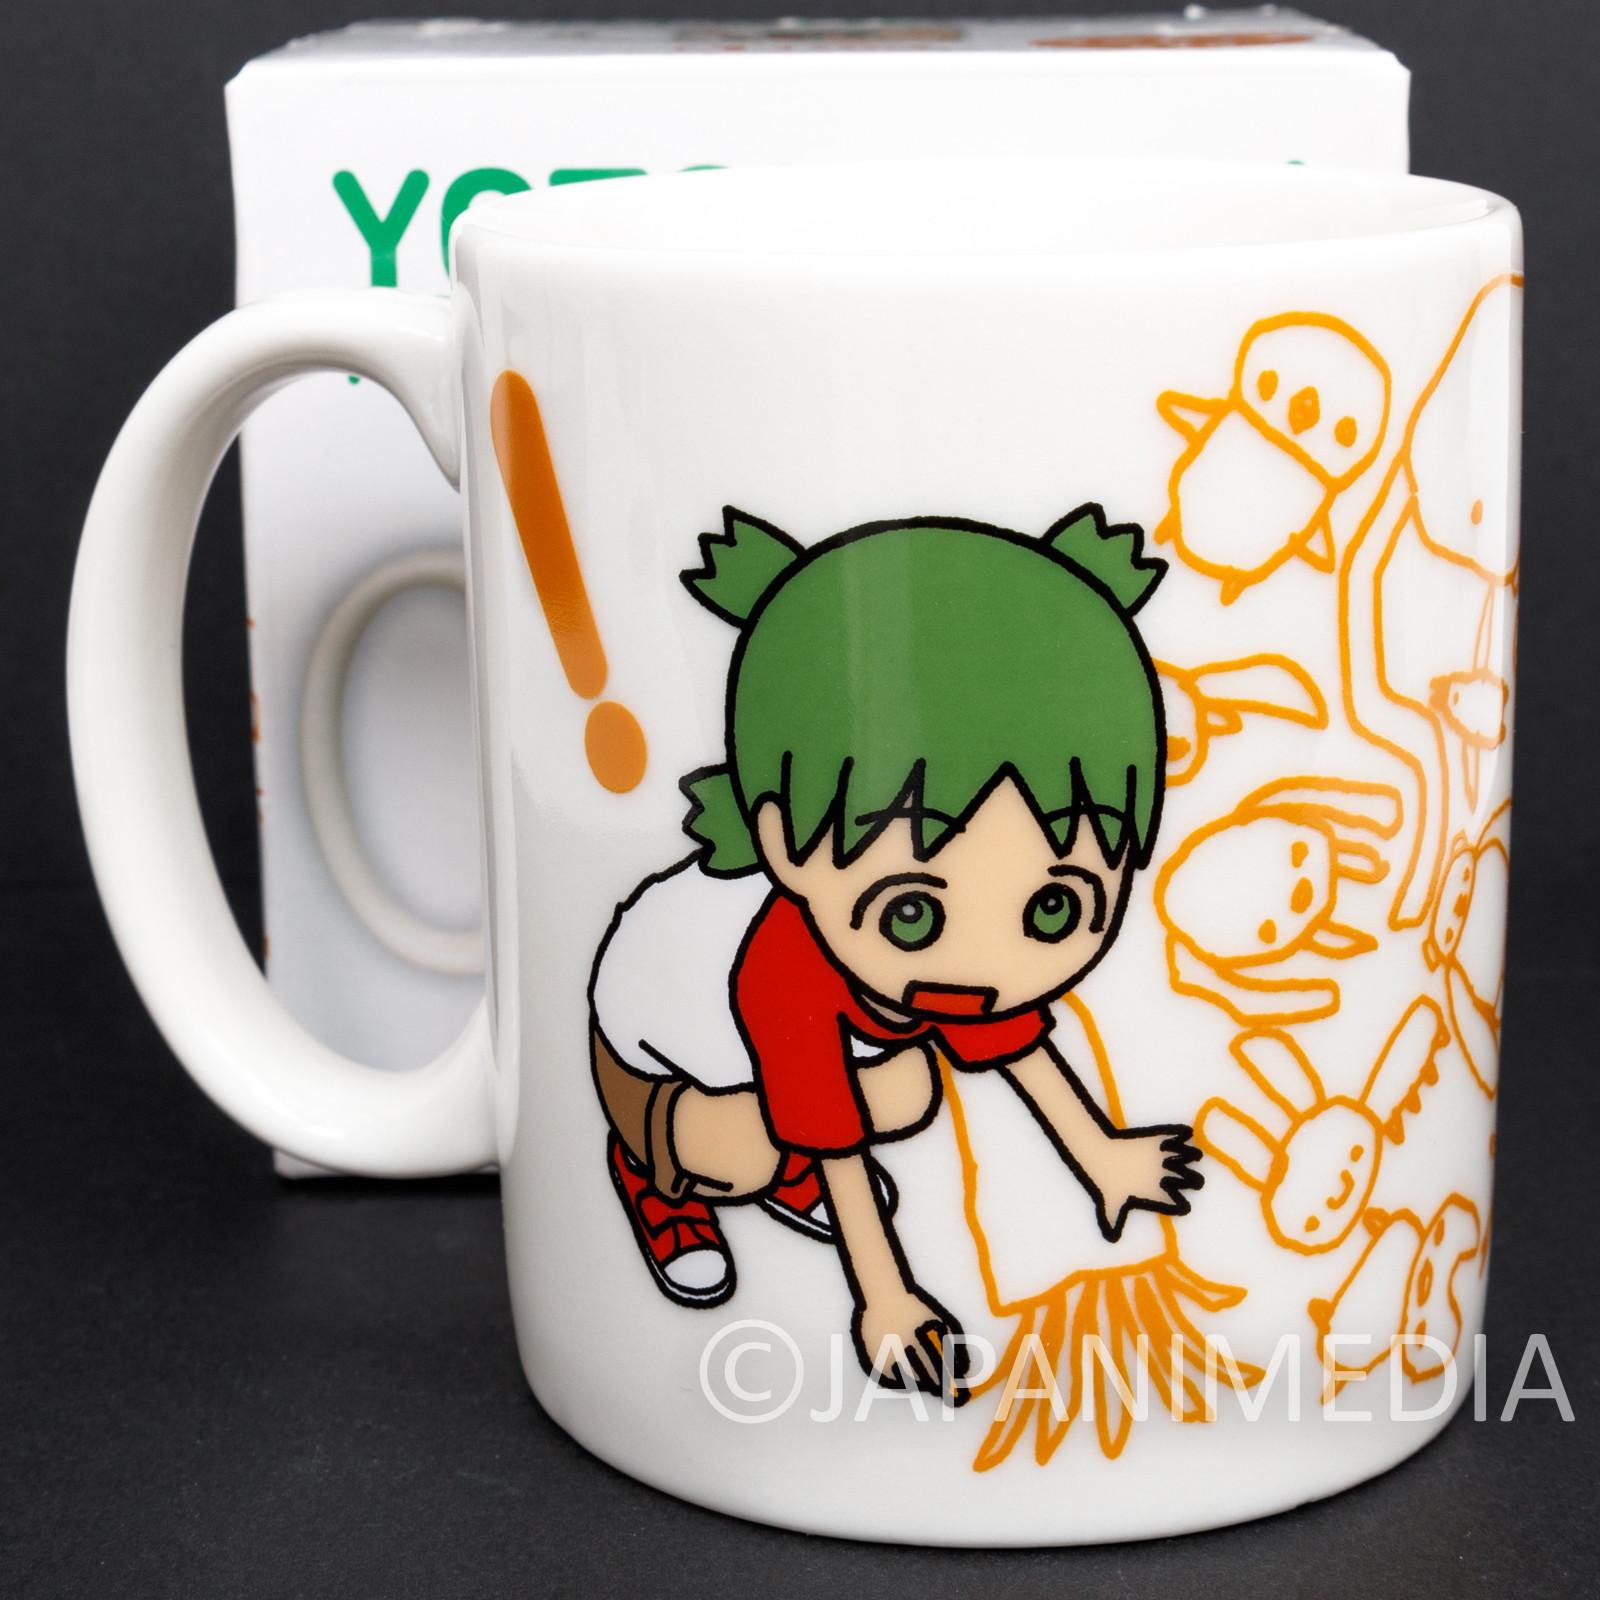 Yotsuba& Yotsuba Mug (Drawing) Taito JAPAN ANIME MANGA